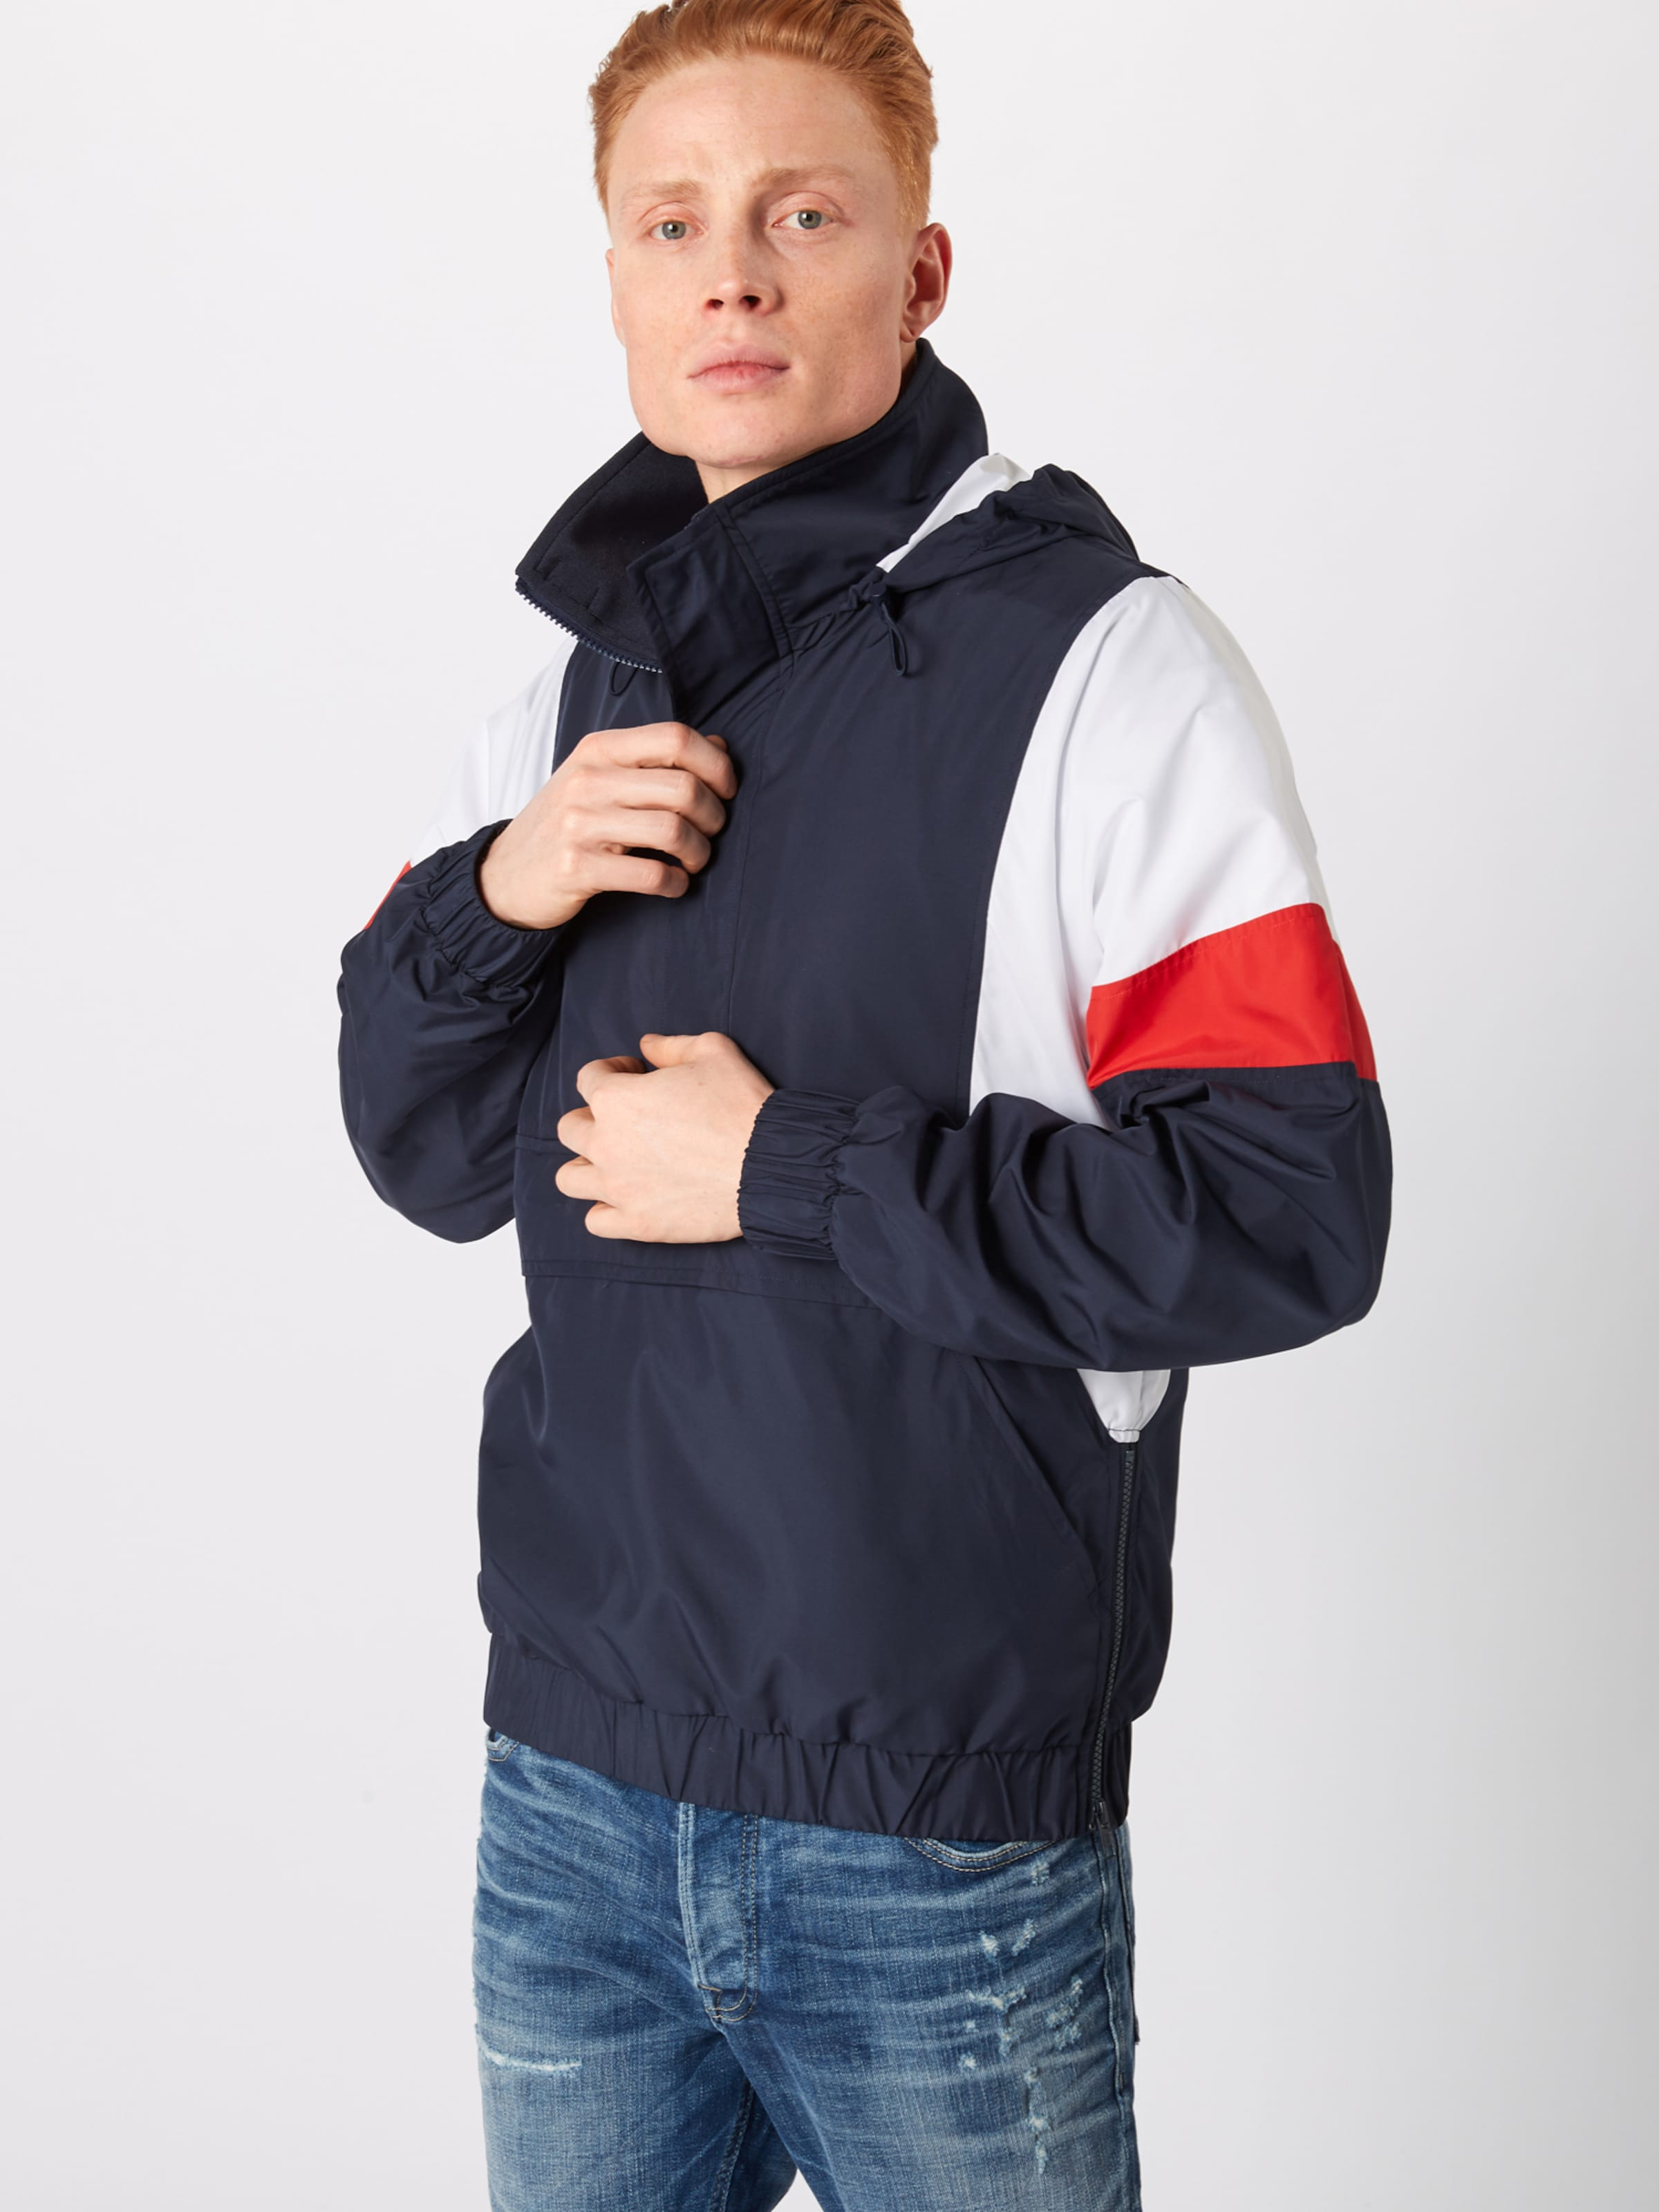 Classics tone In 3 Urban Weiß NavyRot Pull Jacke Over Jacket' 'light XiuZPk